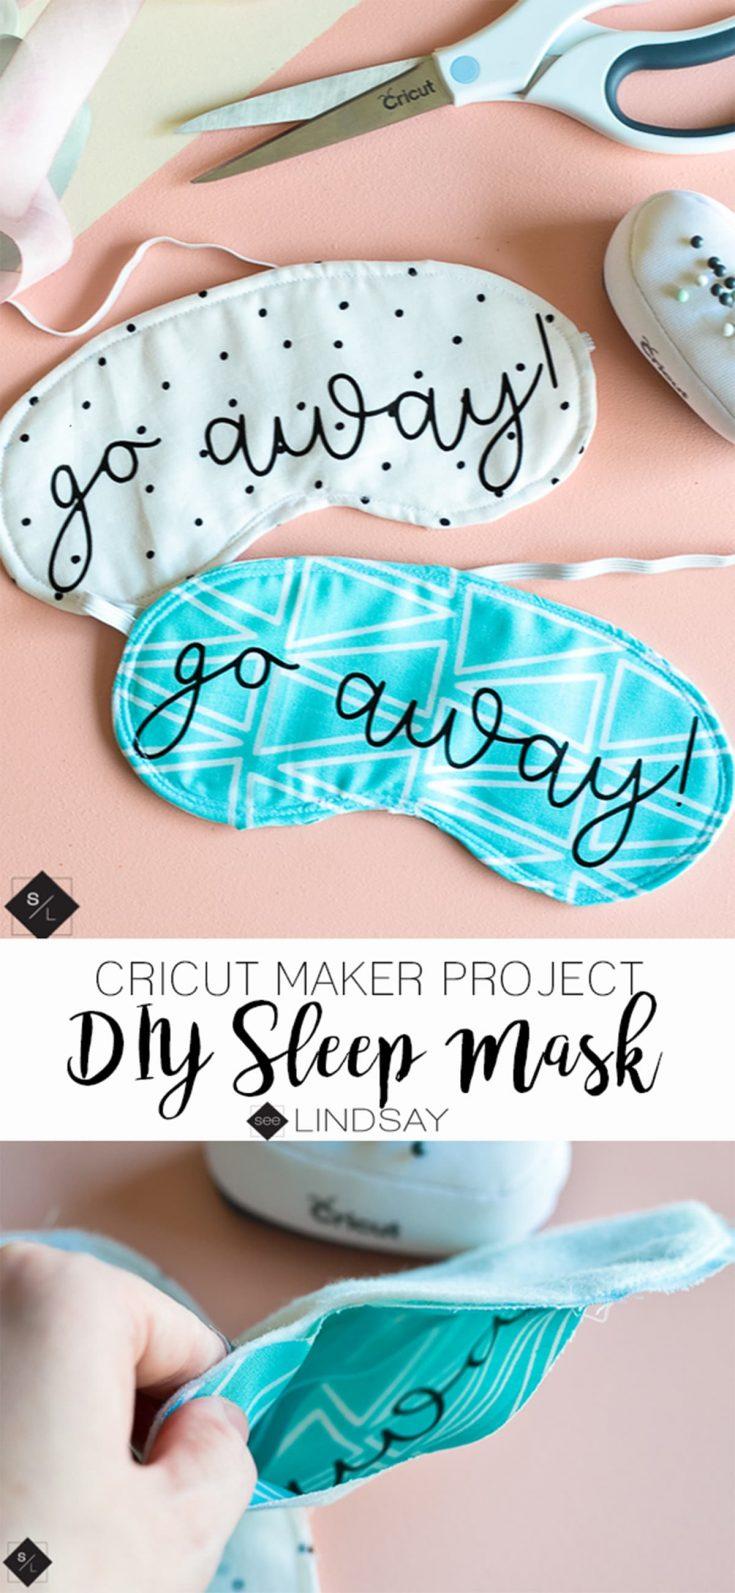 DIY Sleep Mask using your Cricut Maker